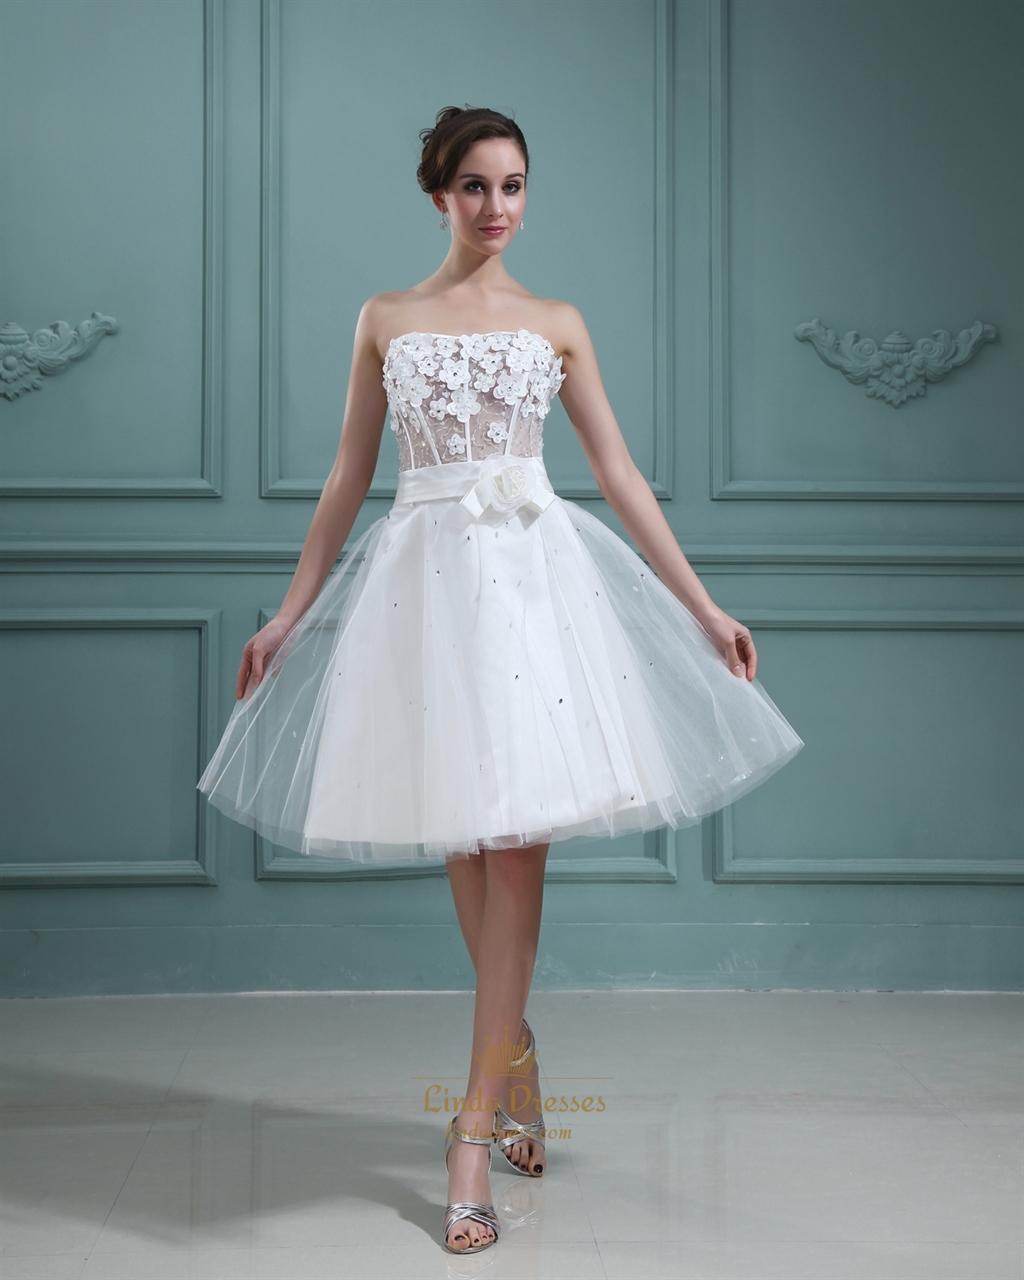 Short Strapless Dress With Floral Embellishment | Linda Dress